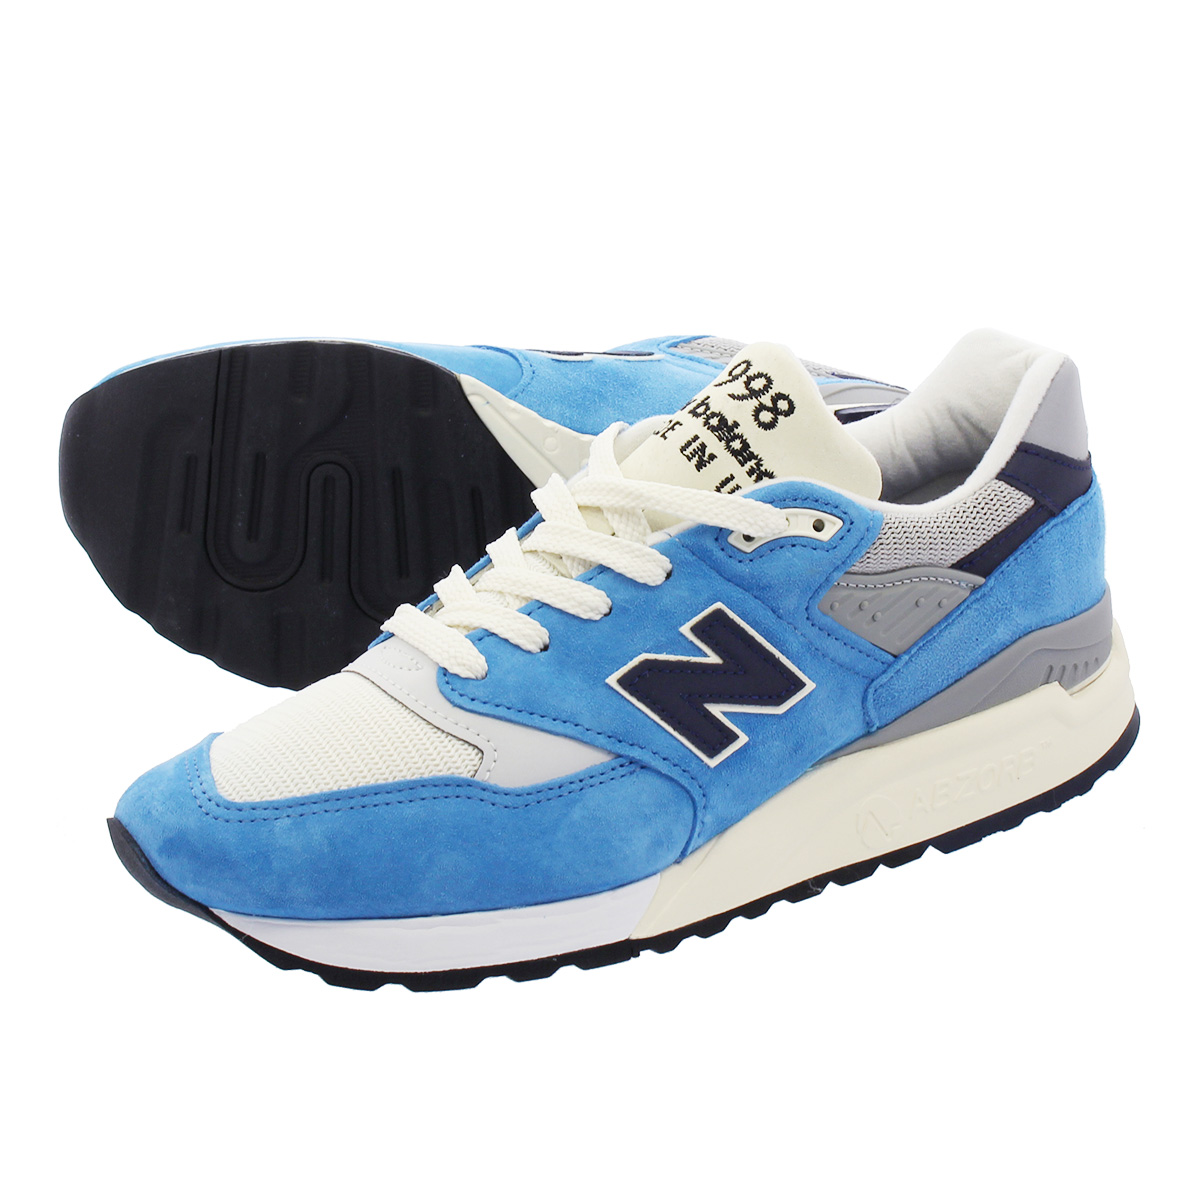 cheap for discount 25c46 b5219 NEW BALANCE M998JCW New Balance M 998 JCW BLUE/NAVY/WHITE